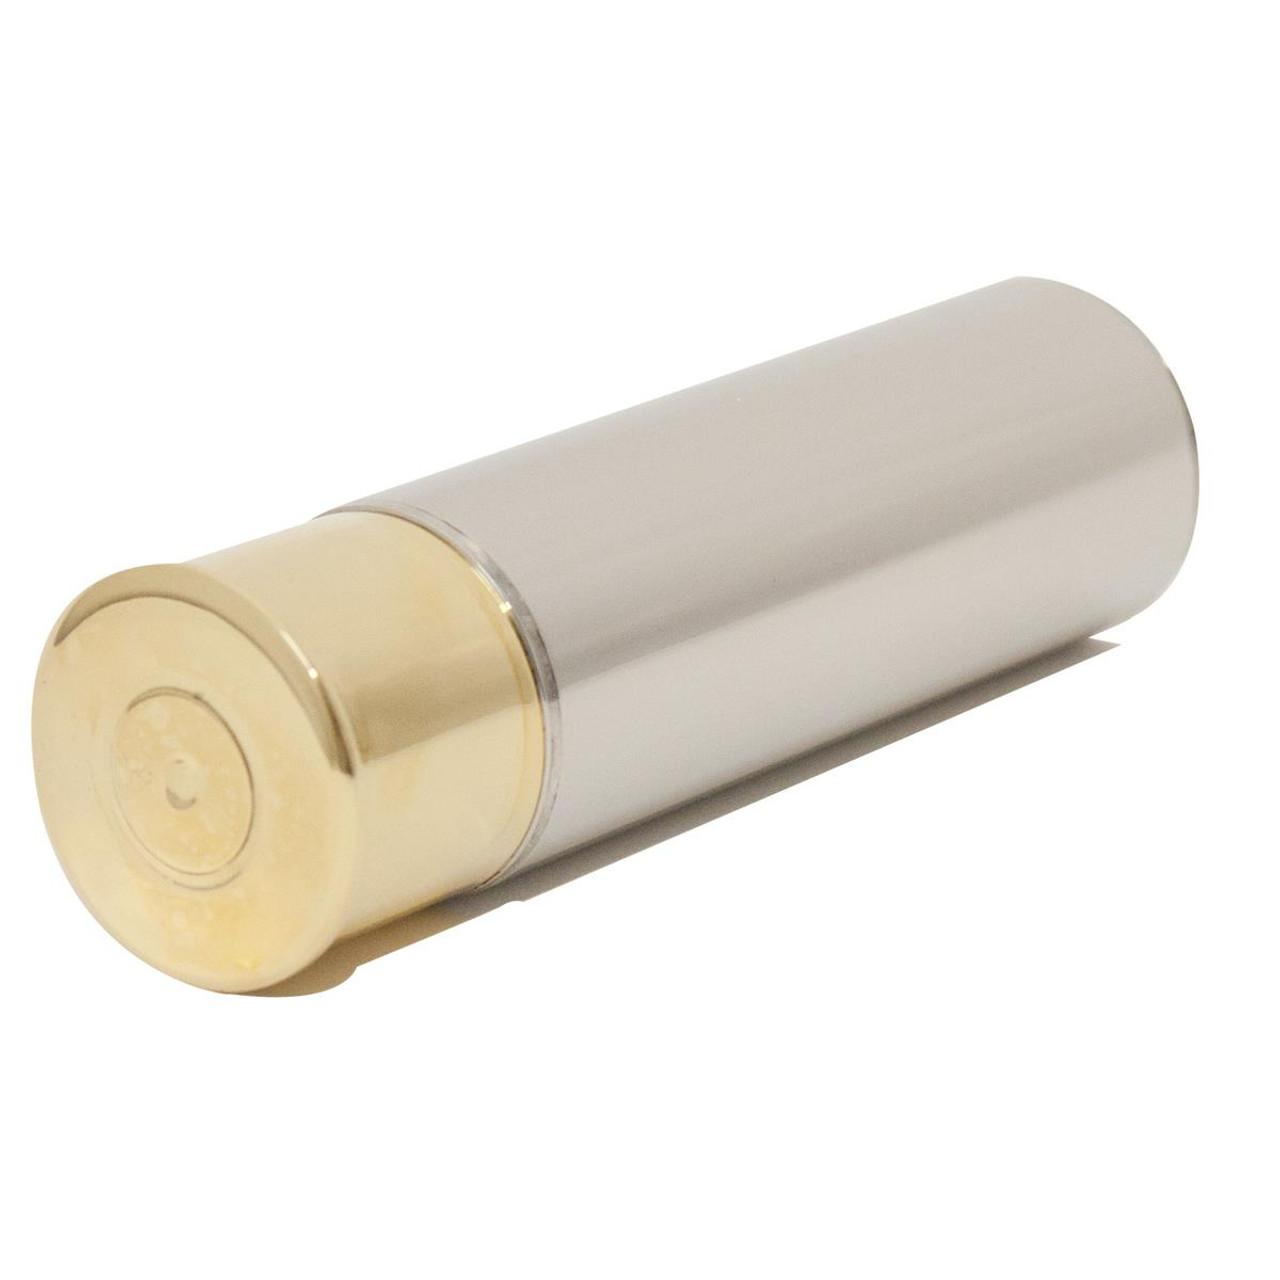 Bisley Cartridge Flask